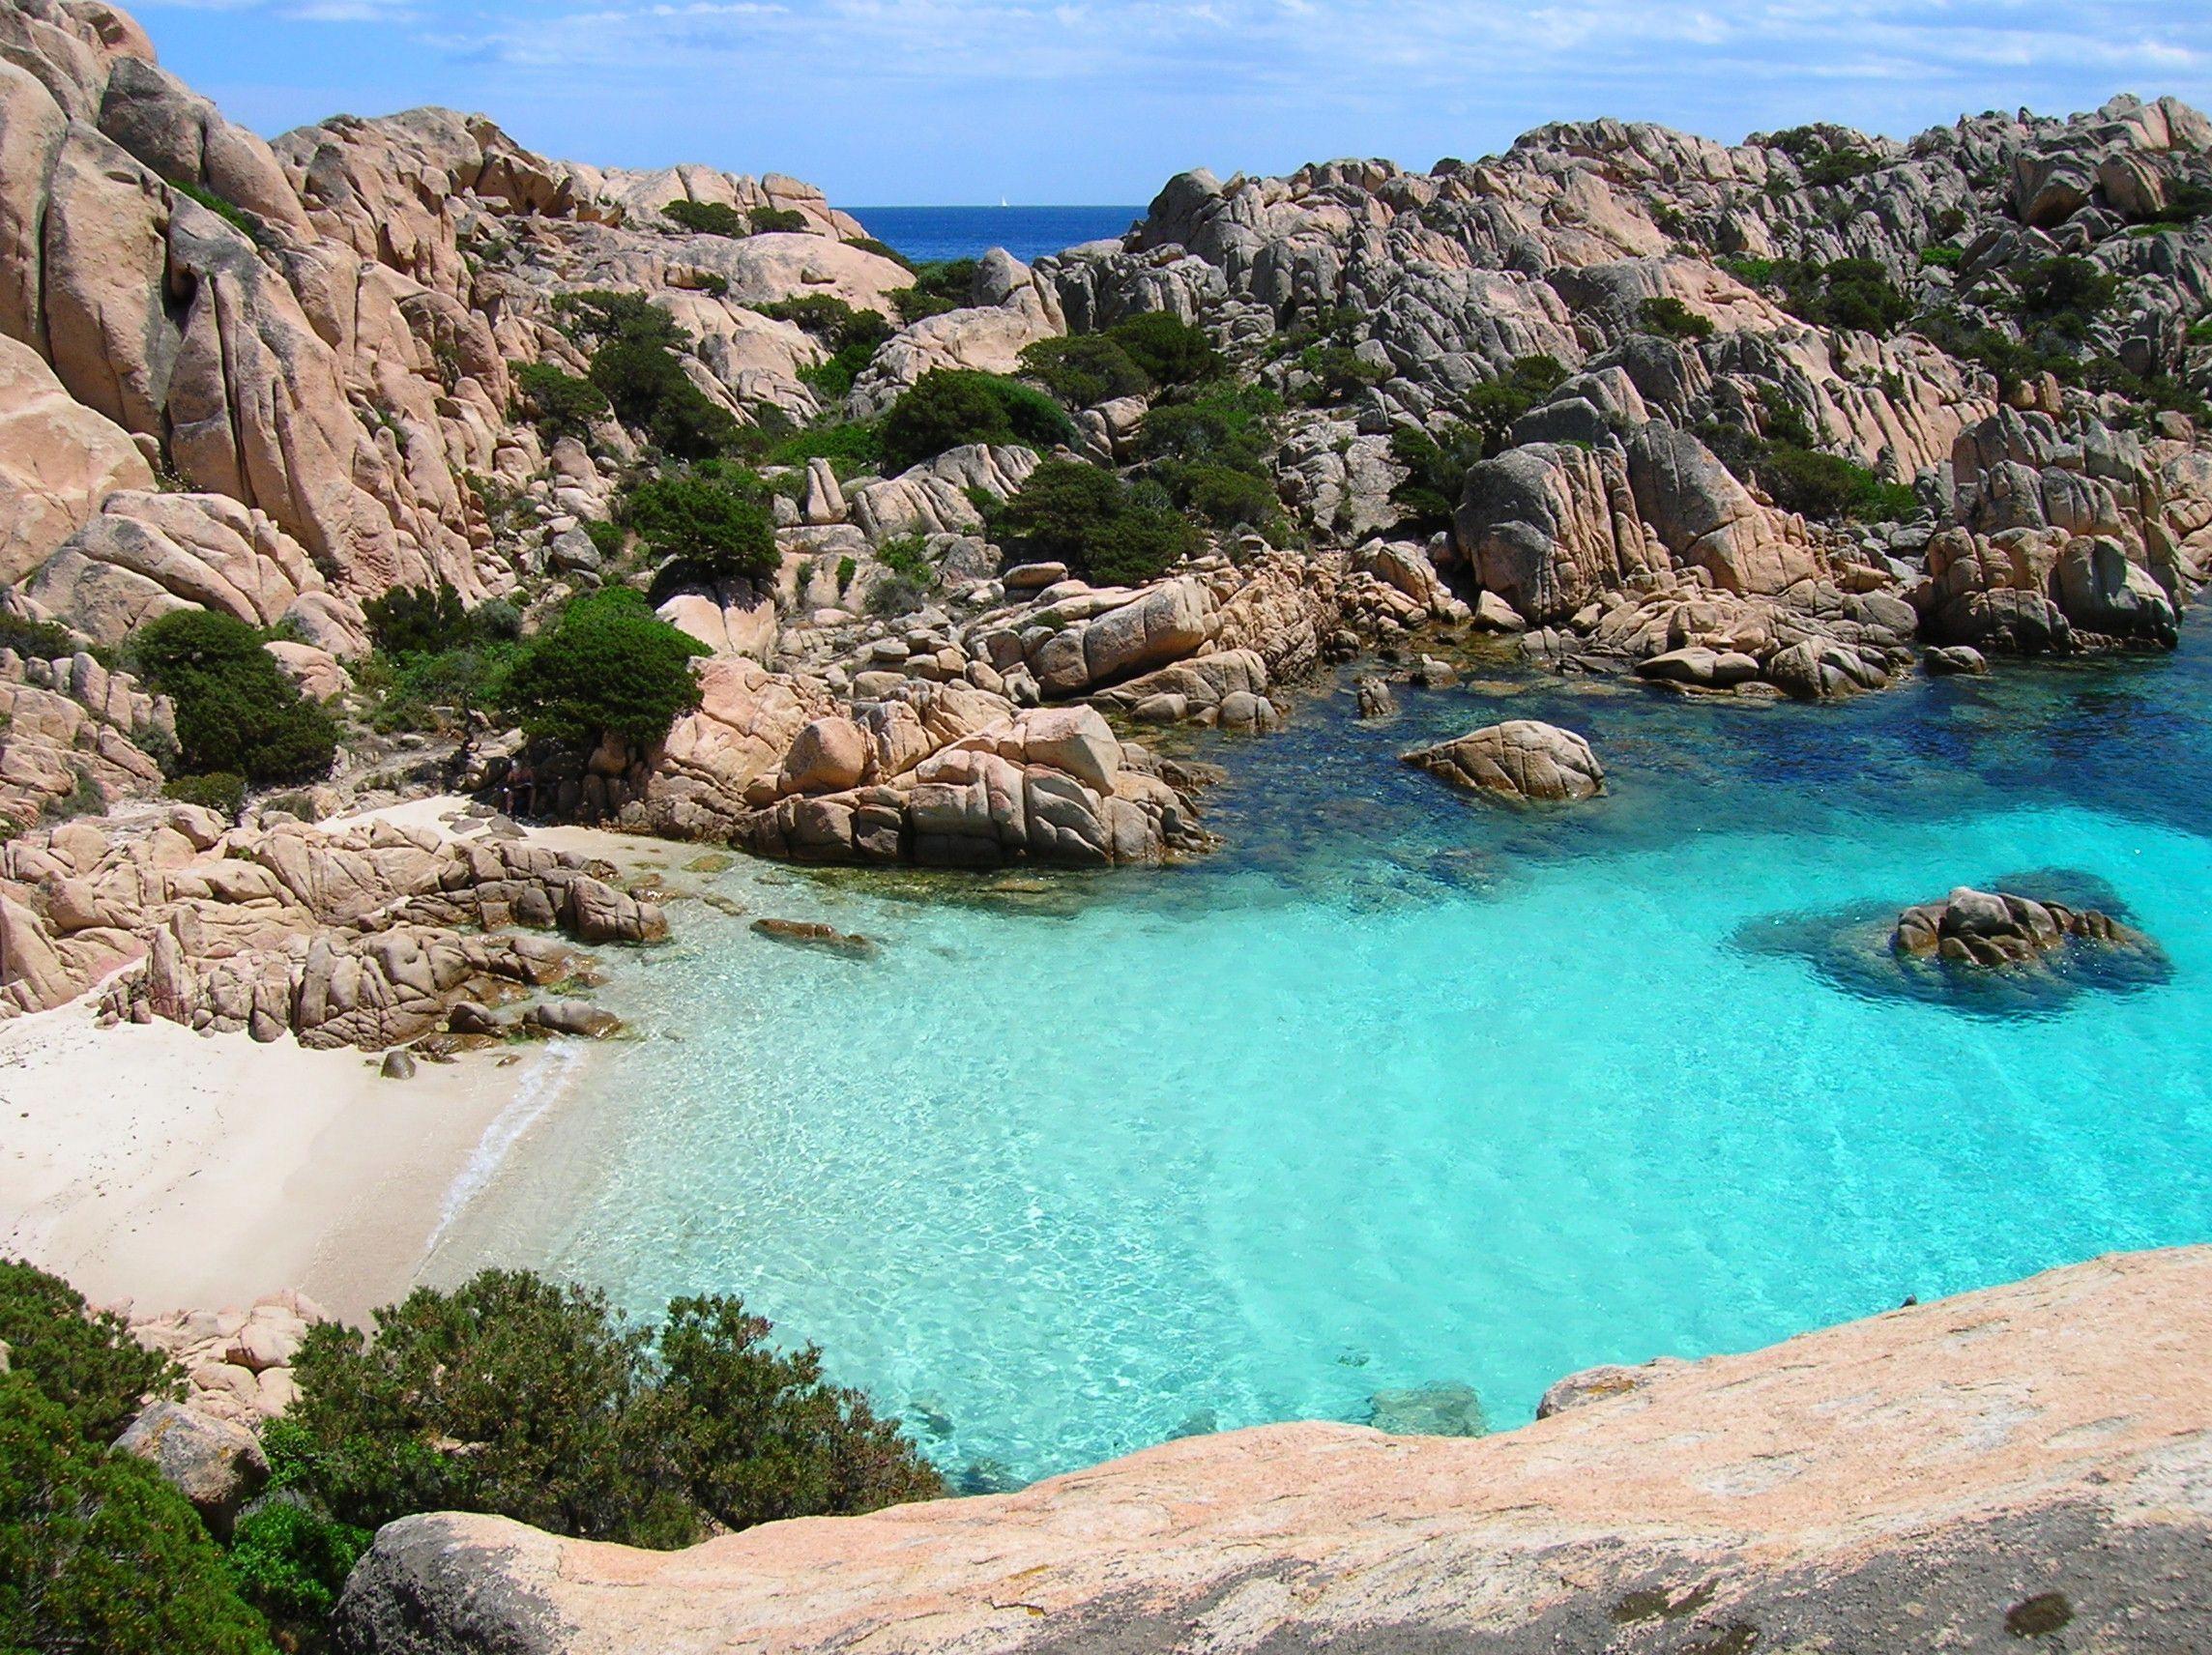 Cala Coticcio Sardinia Italy Also Known As Thaiti Beach This